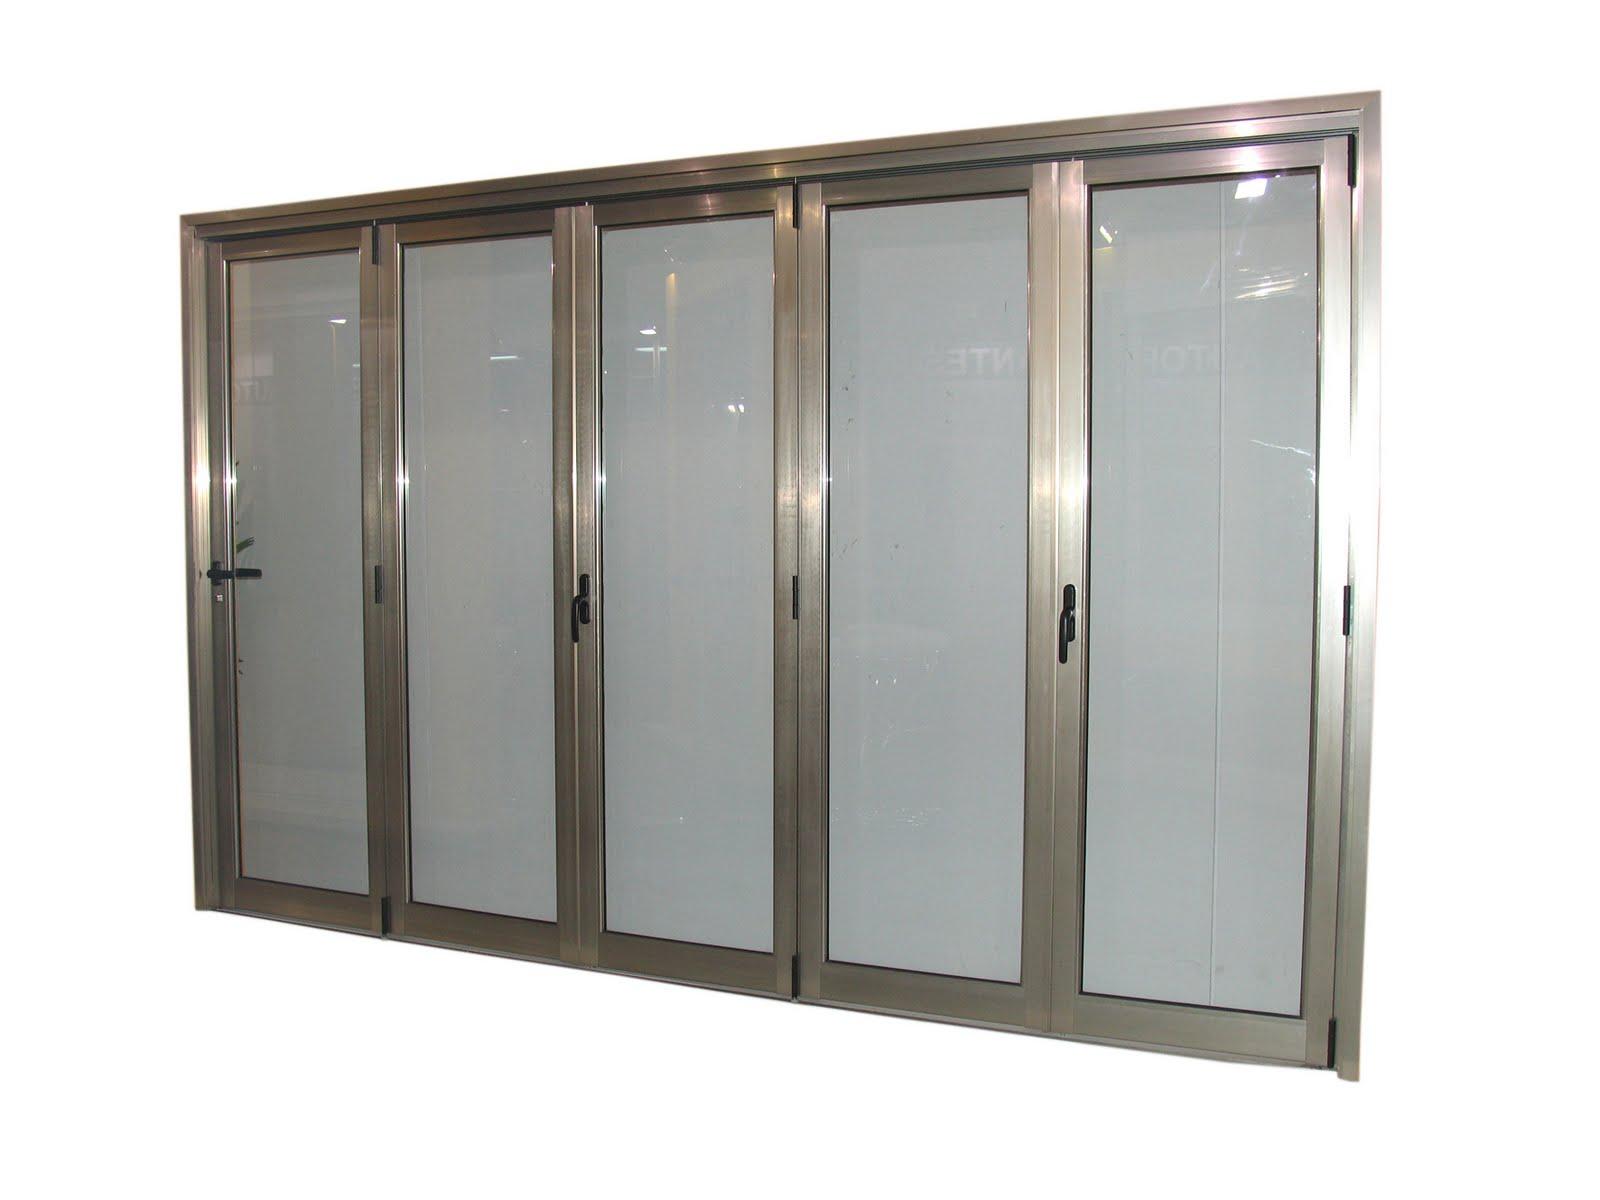 #746357 Galeria De Imagenes De Aberturas De Aluminio Bed Mattress Sale 680 Janelas Pvc Rehau